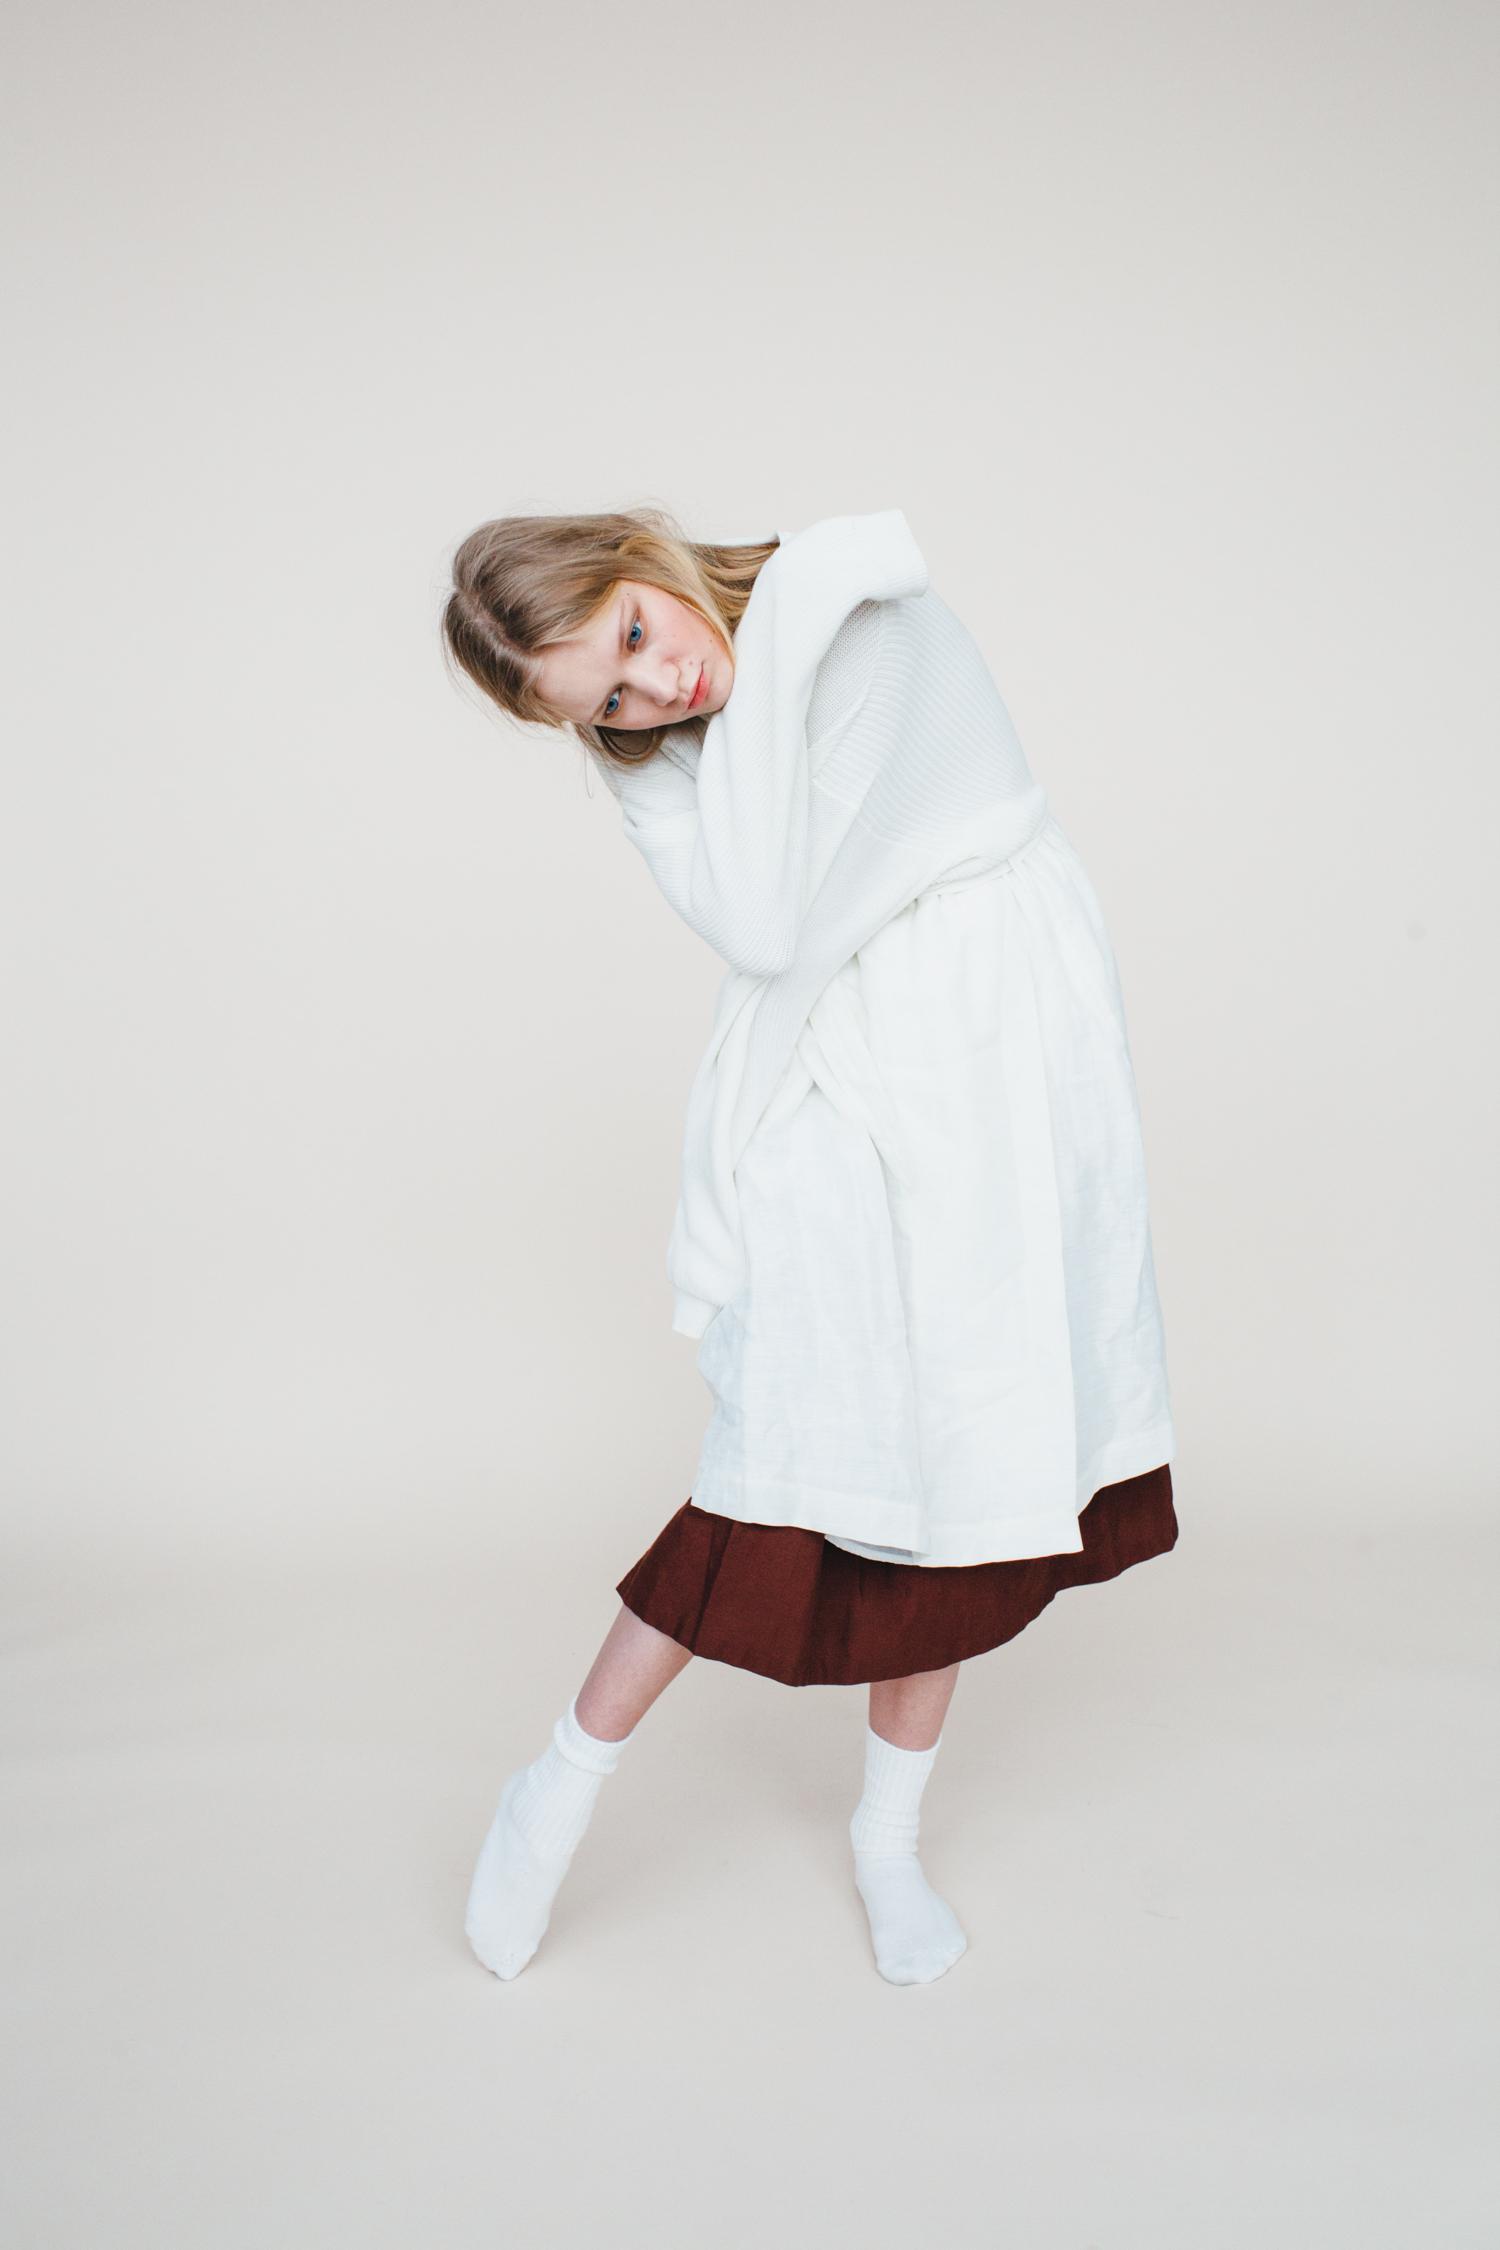 amber_byrne_mahoney_bullet_magazine_editorial_fashion_photography_021.jpg